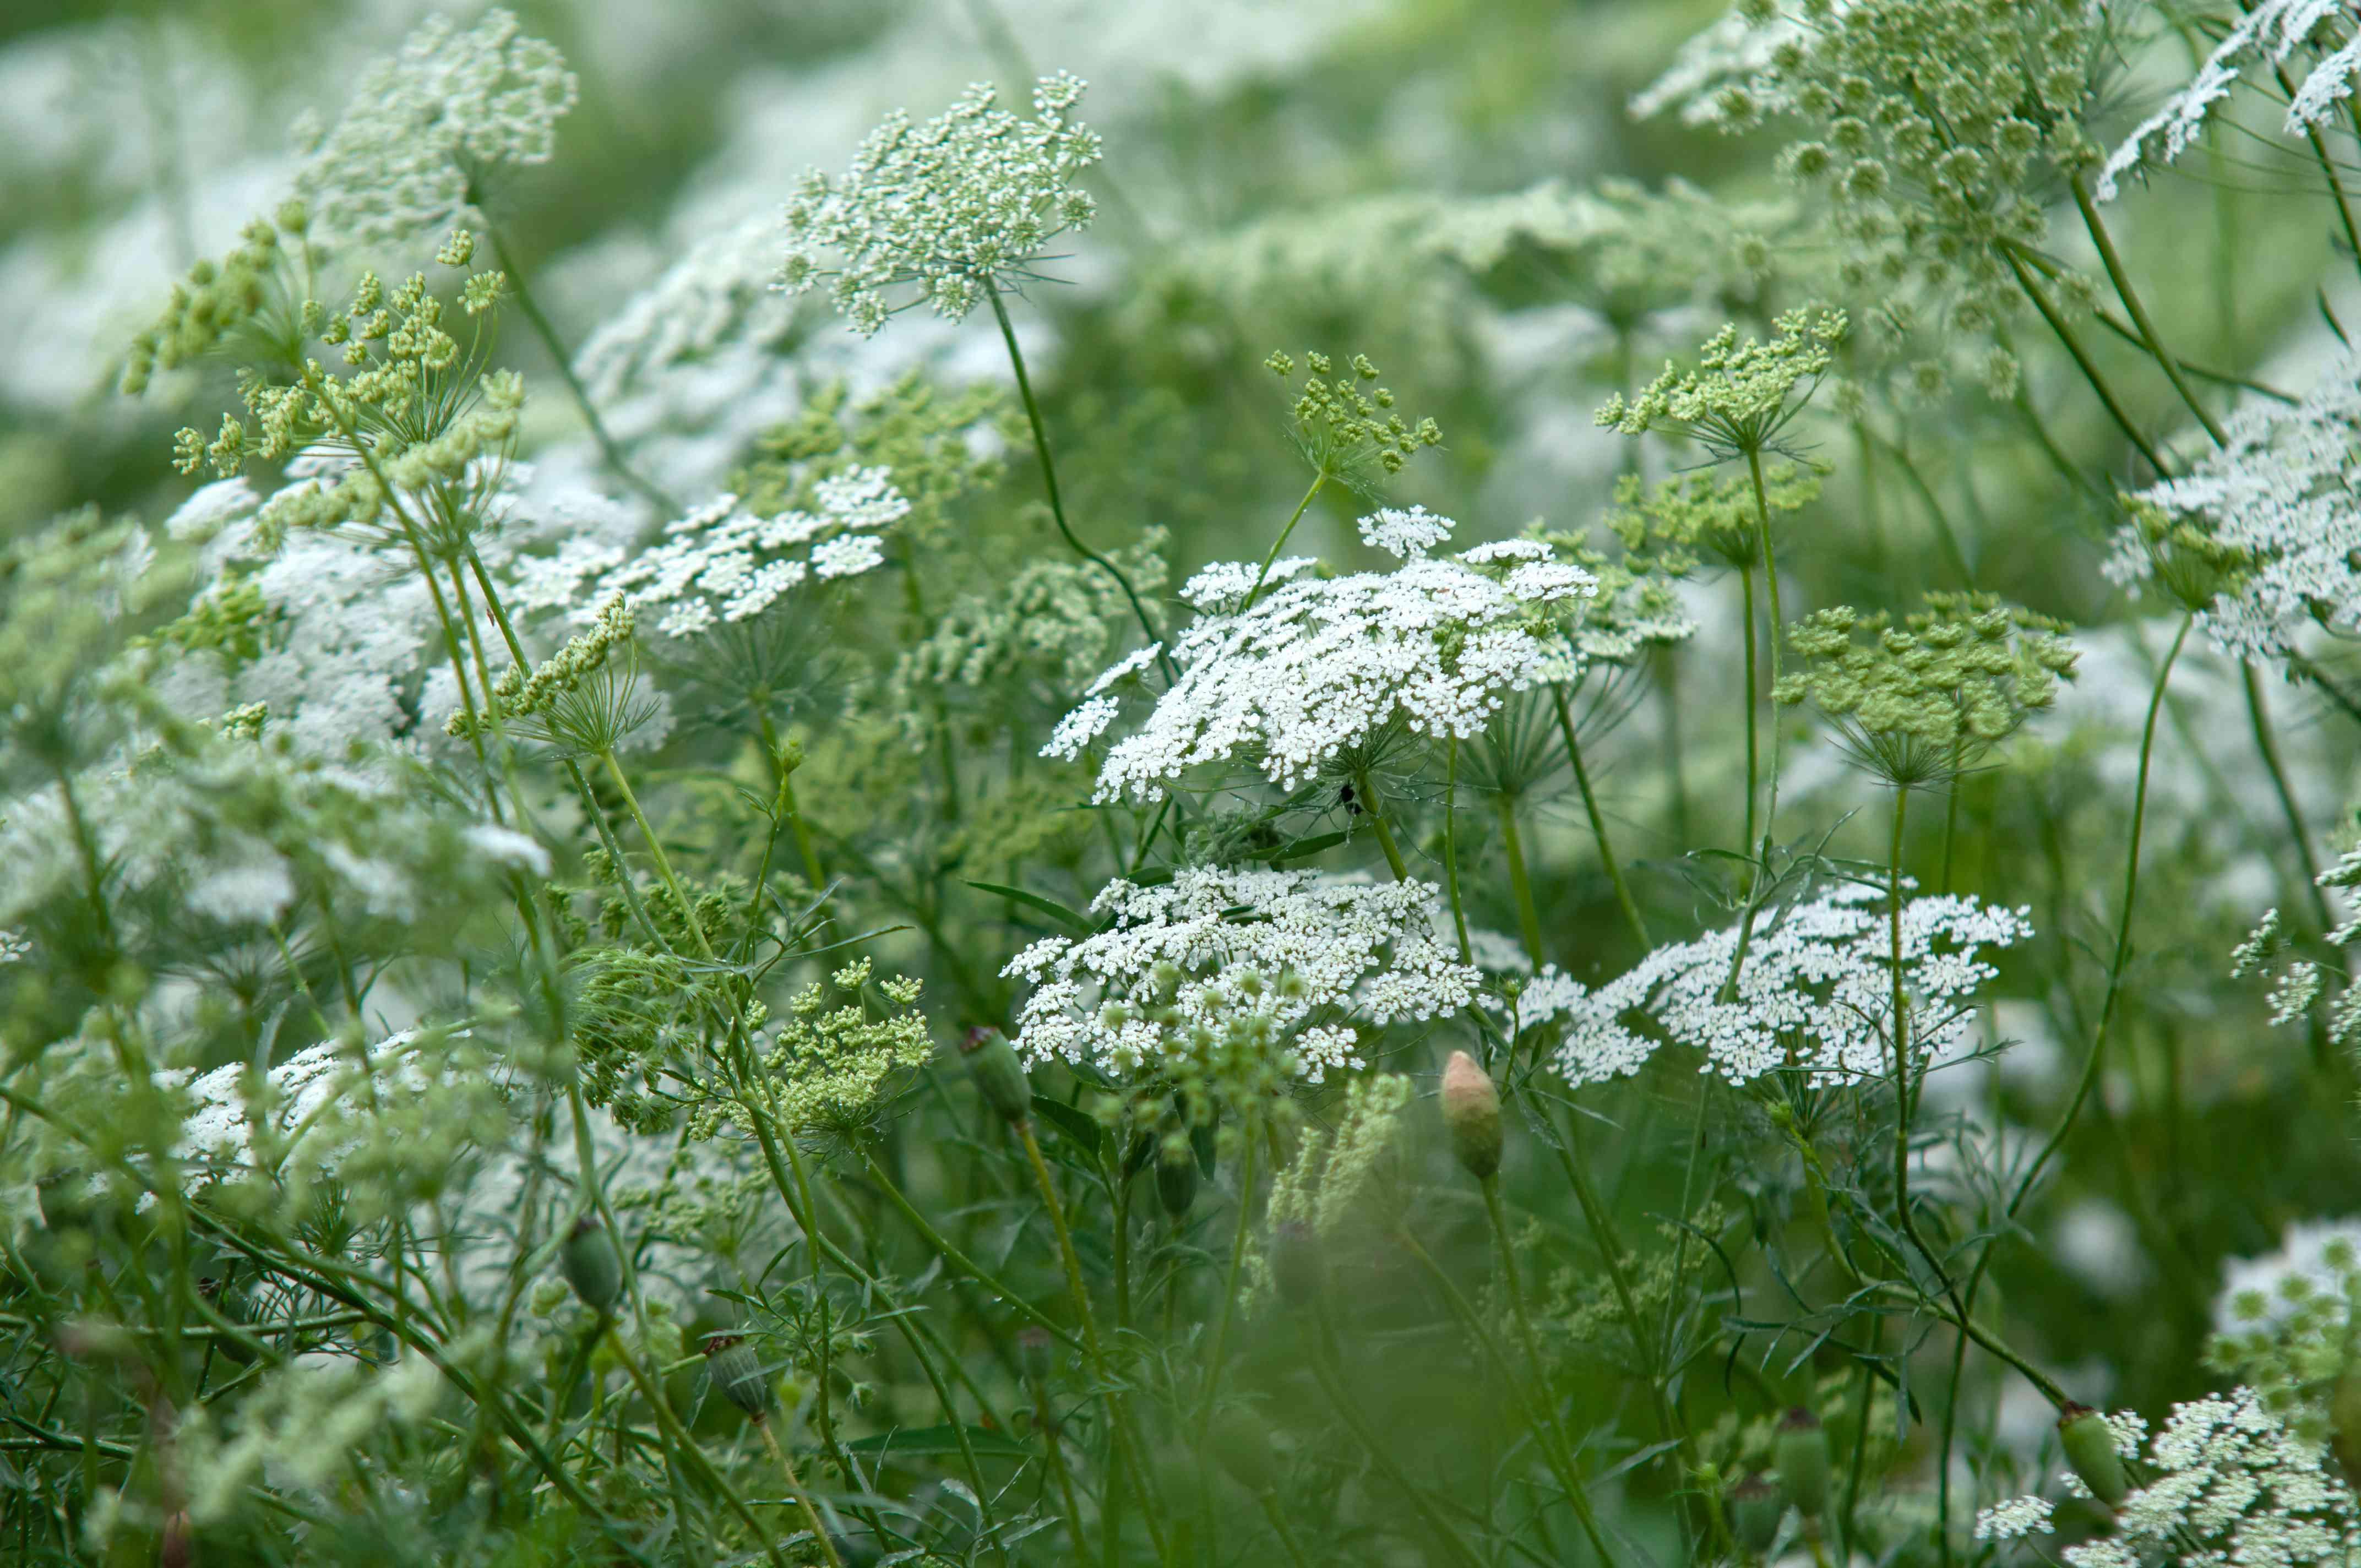 Queen's anne lace wildflowers in garden